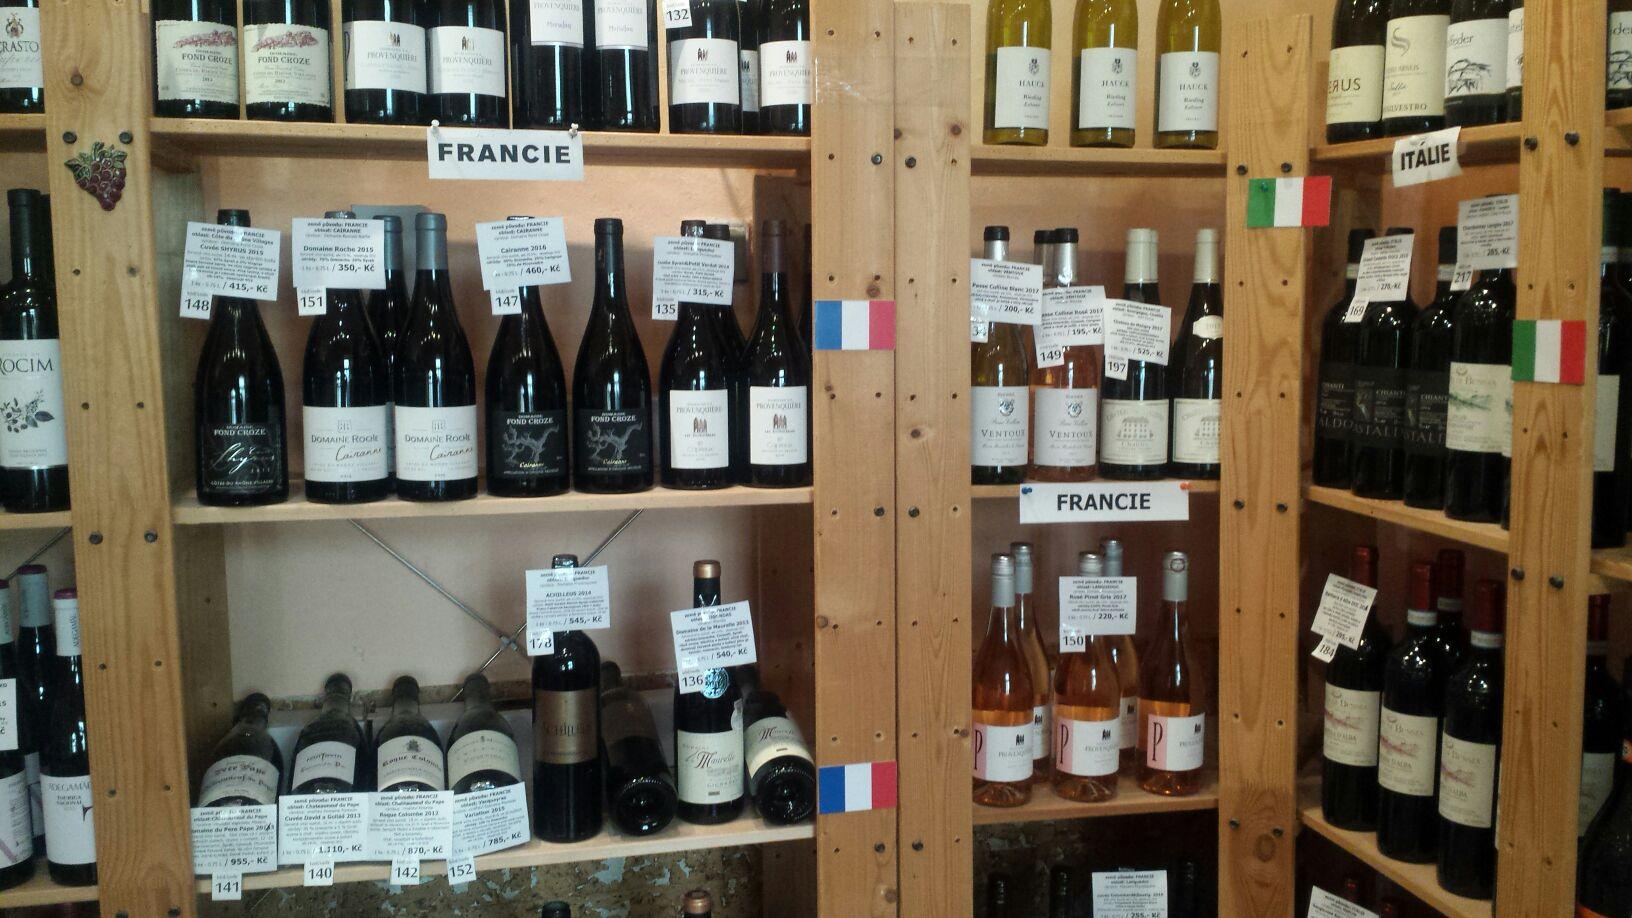 francouzská vína v obchodu a e-shopu